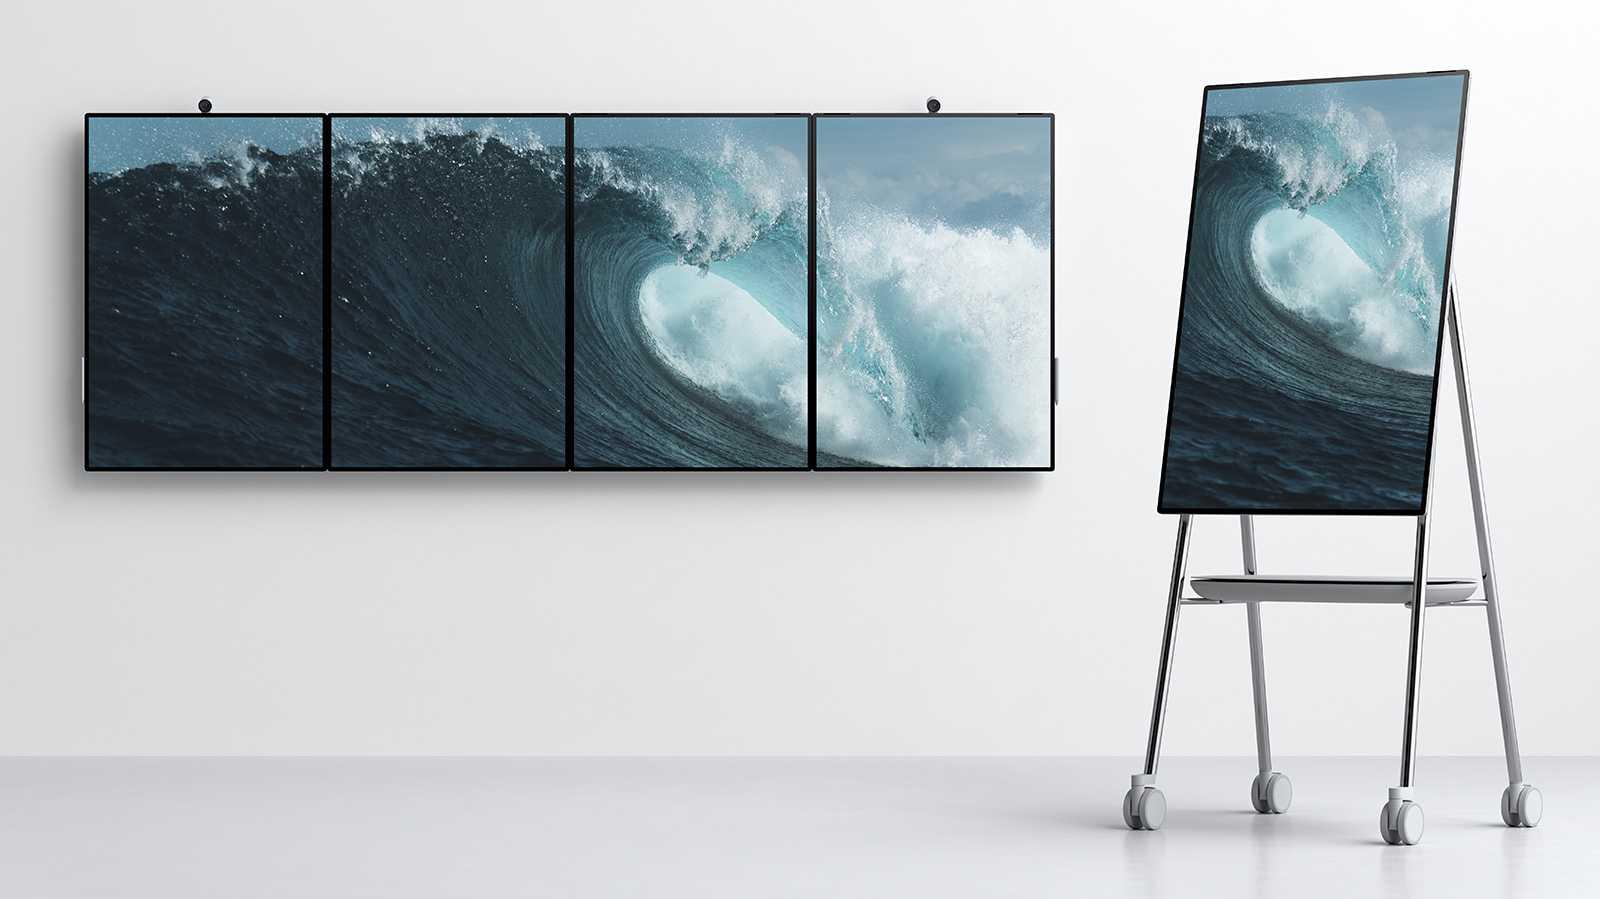 Tablet mit 50-Zoll-Display: Microsoft kündigt Surface Hub 2 an